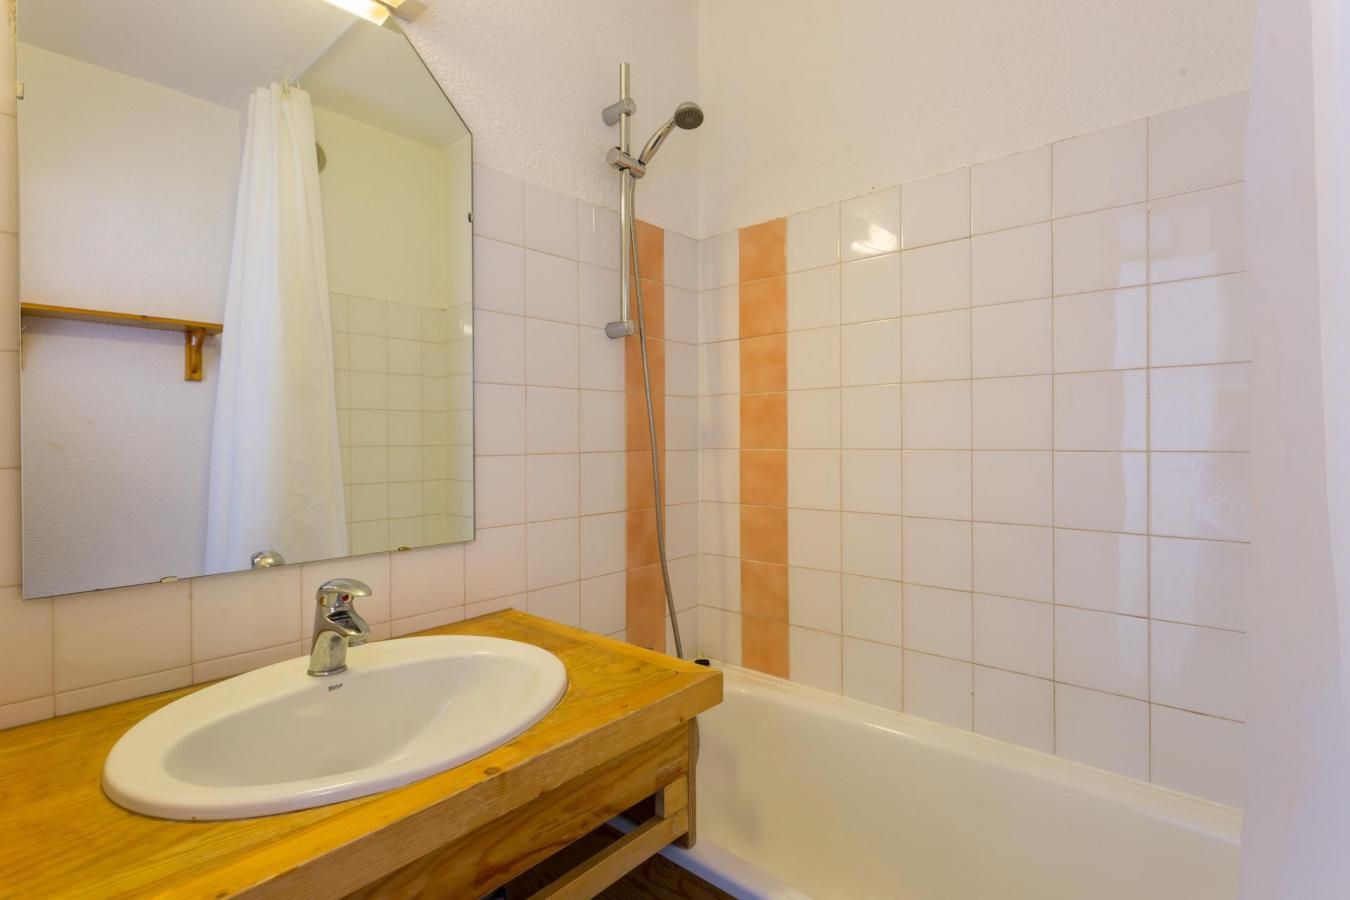 Location au ski Studio 3 personnes (35) - Residence Le Zenith - Val Thorens